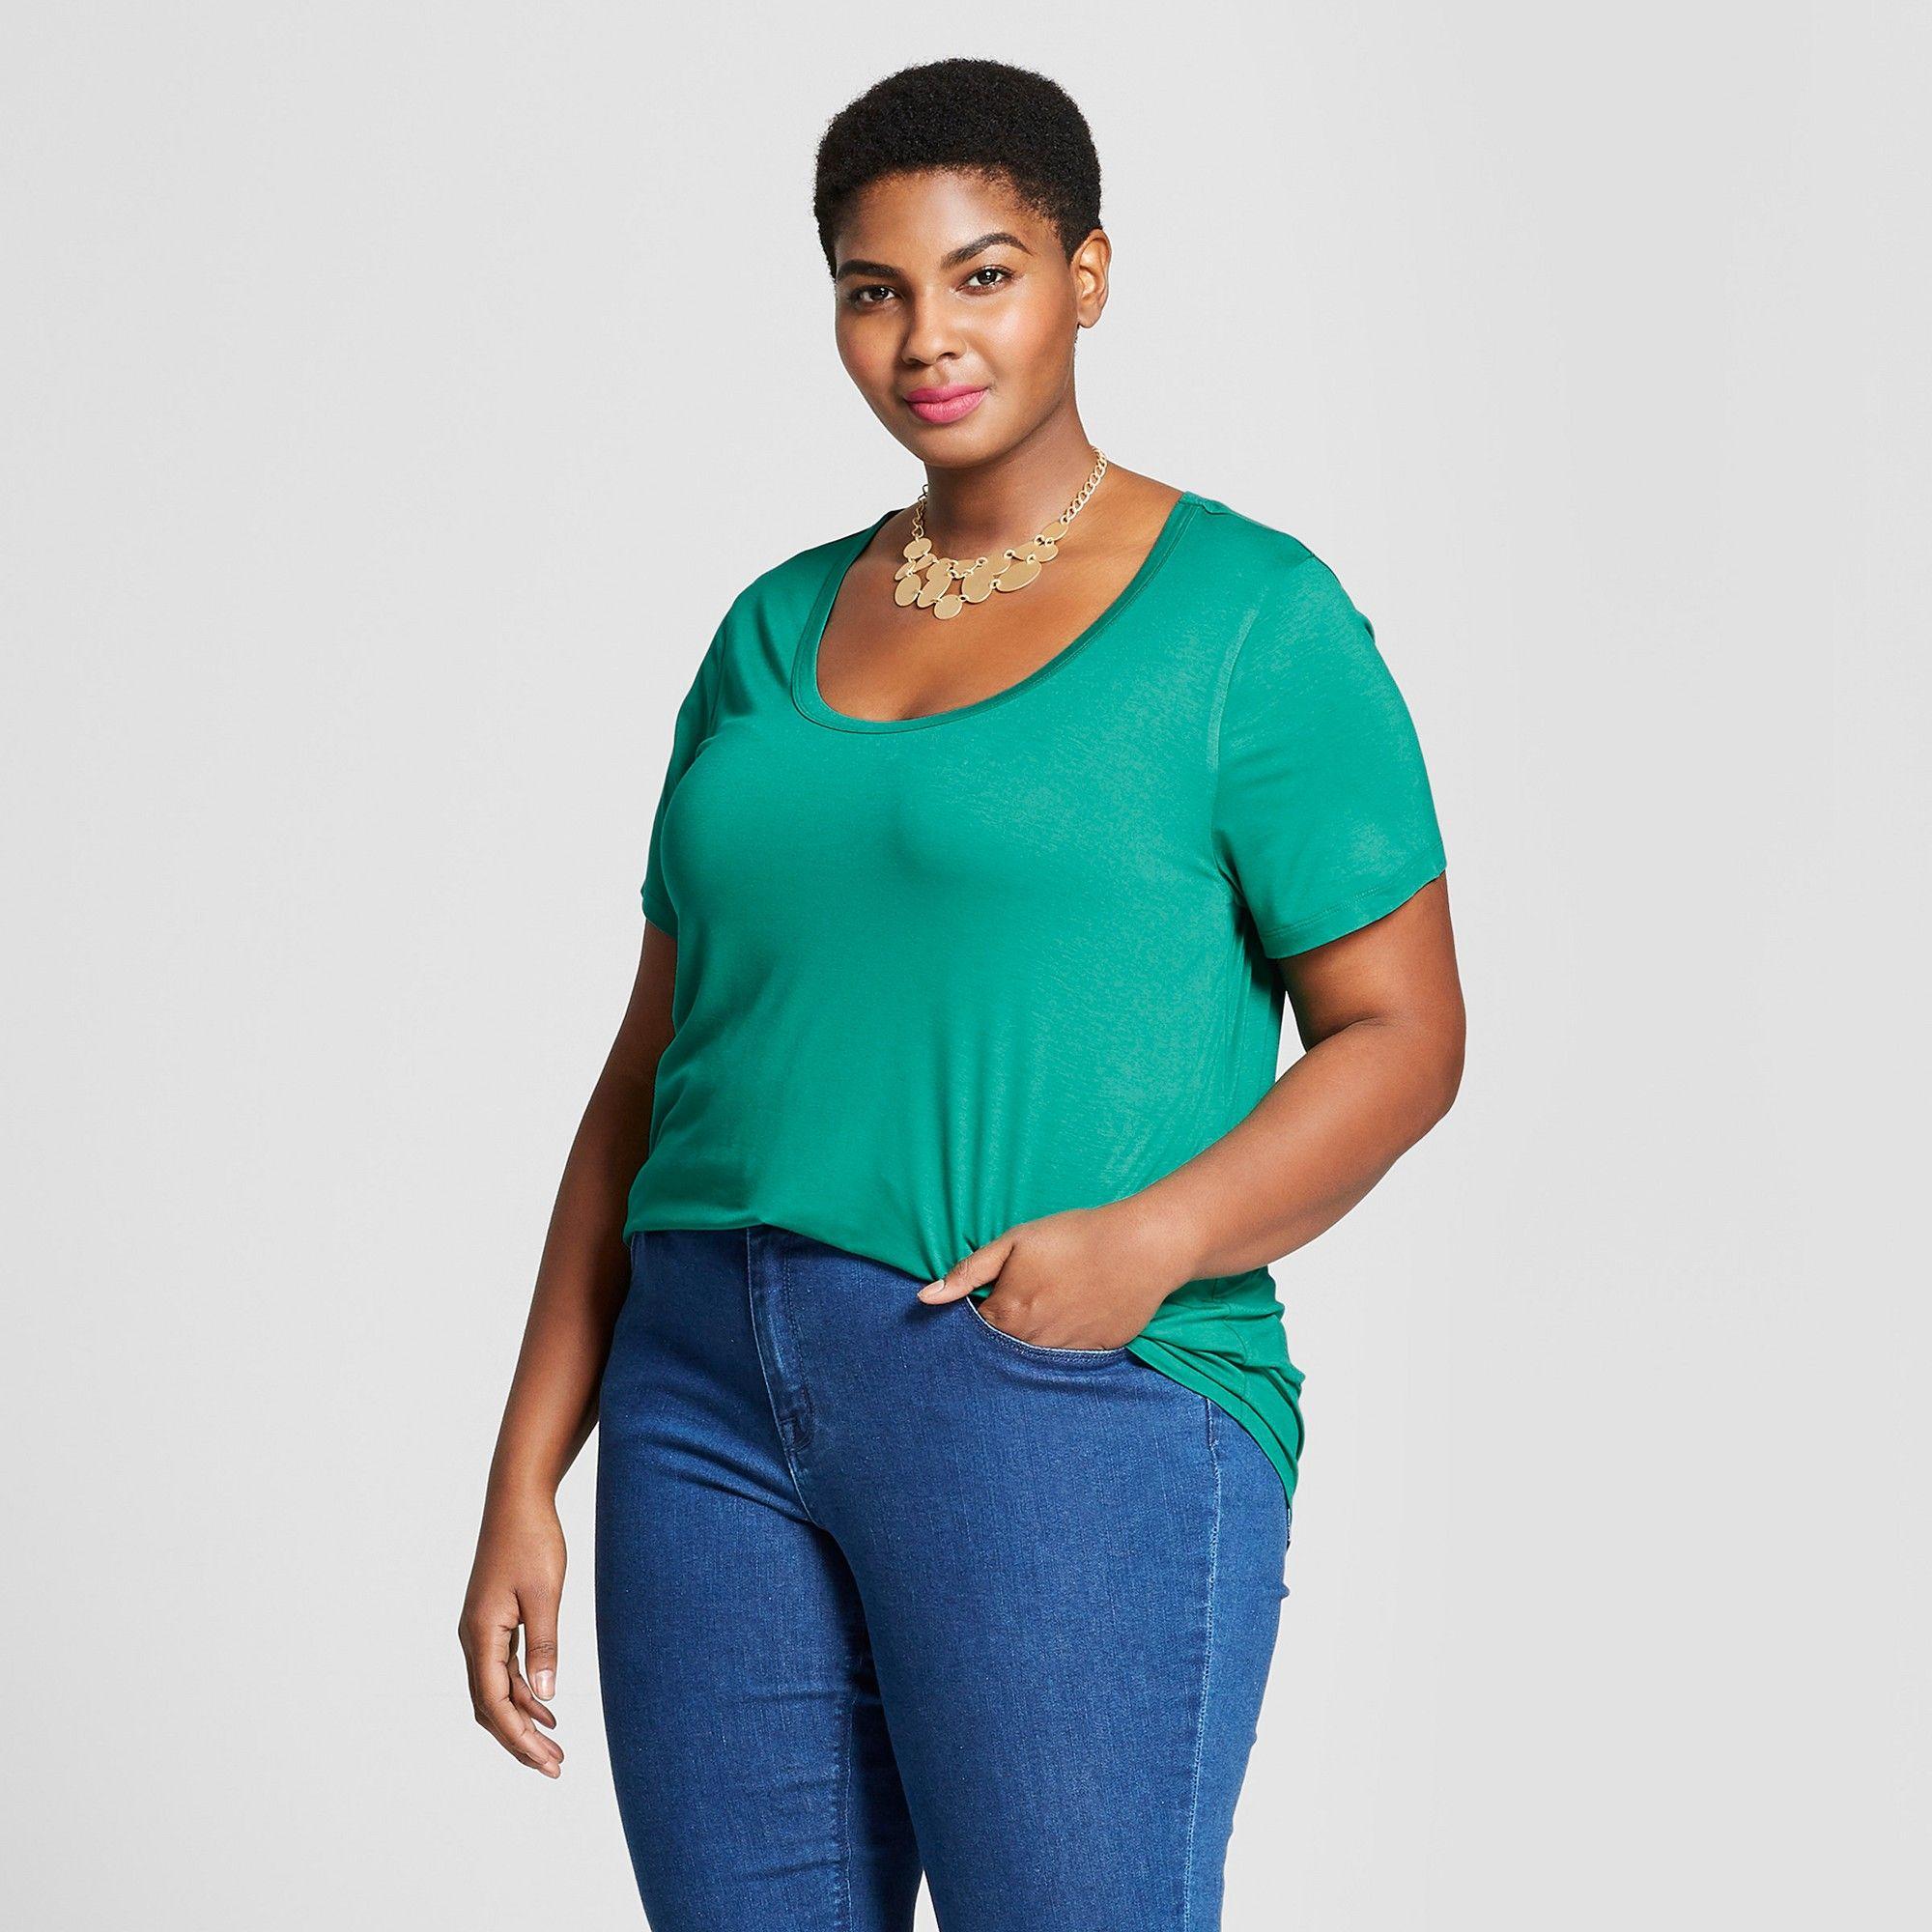 88bbb98d9a9 Women s Plus Size Short Sleeve Perfect T-Shirt - Ava   Viv Mint Gel ...